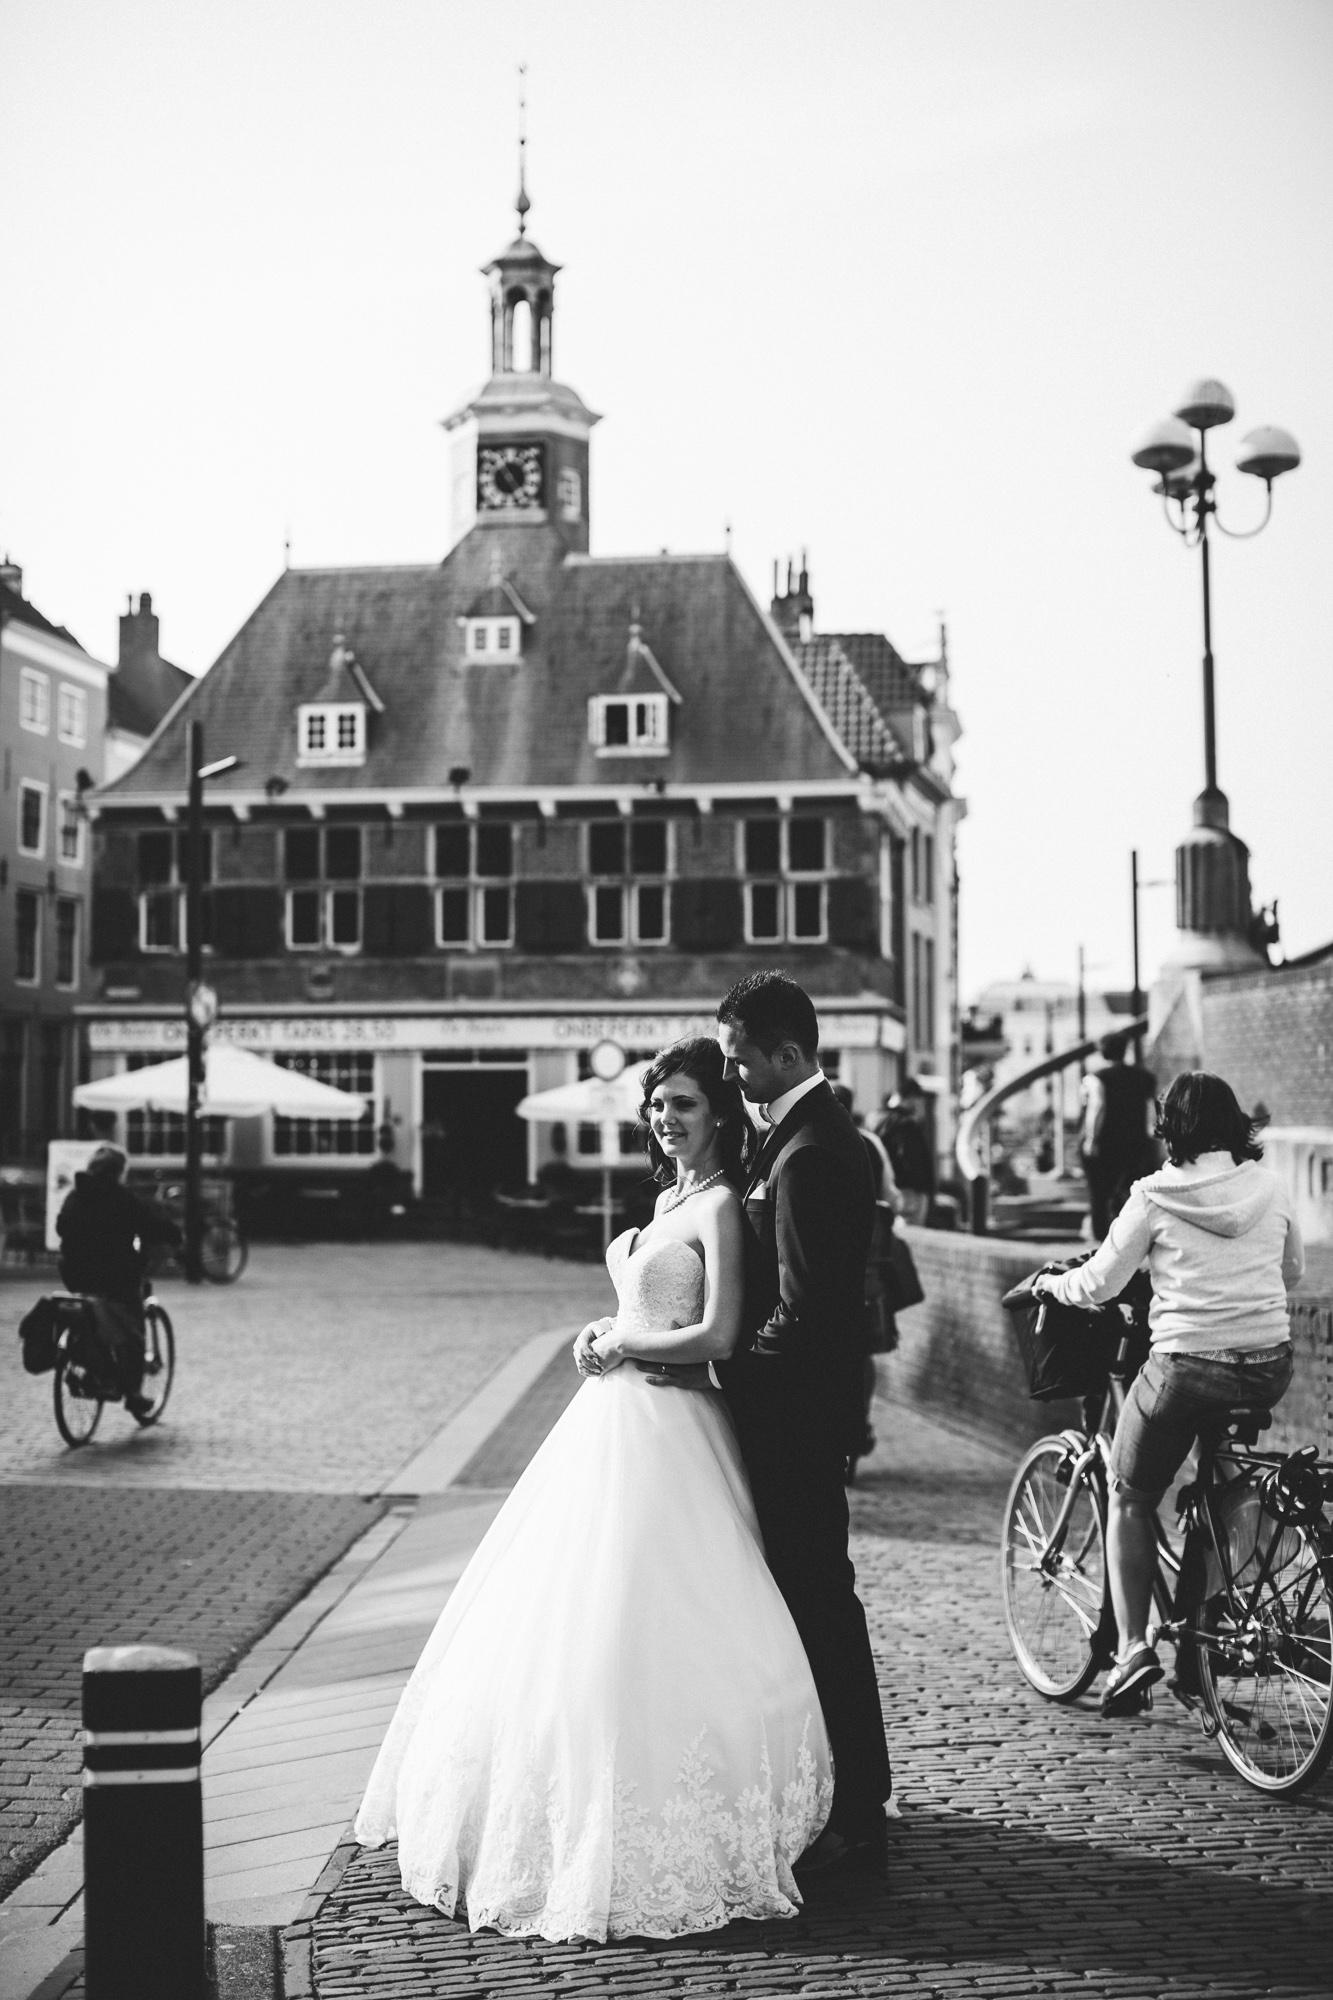 after wedding ia 025 - Afterwedding in Zeeland / Holland